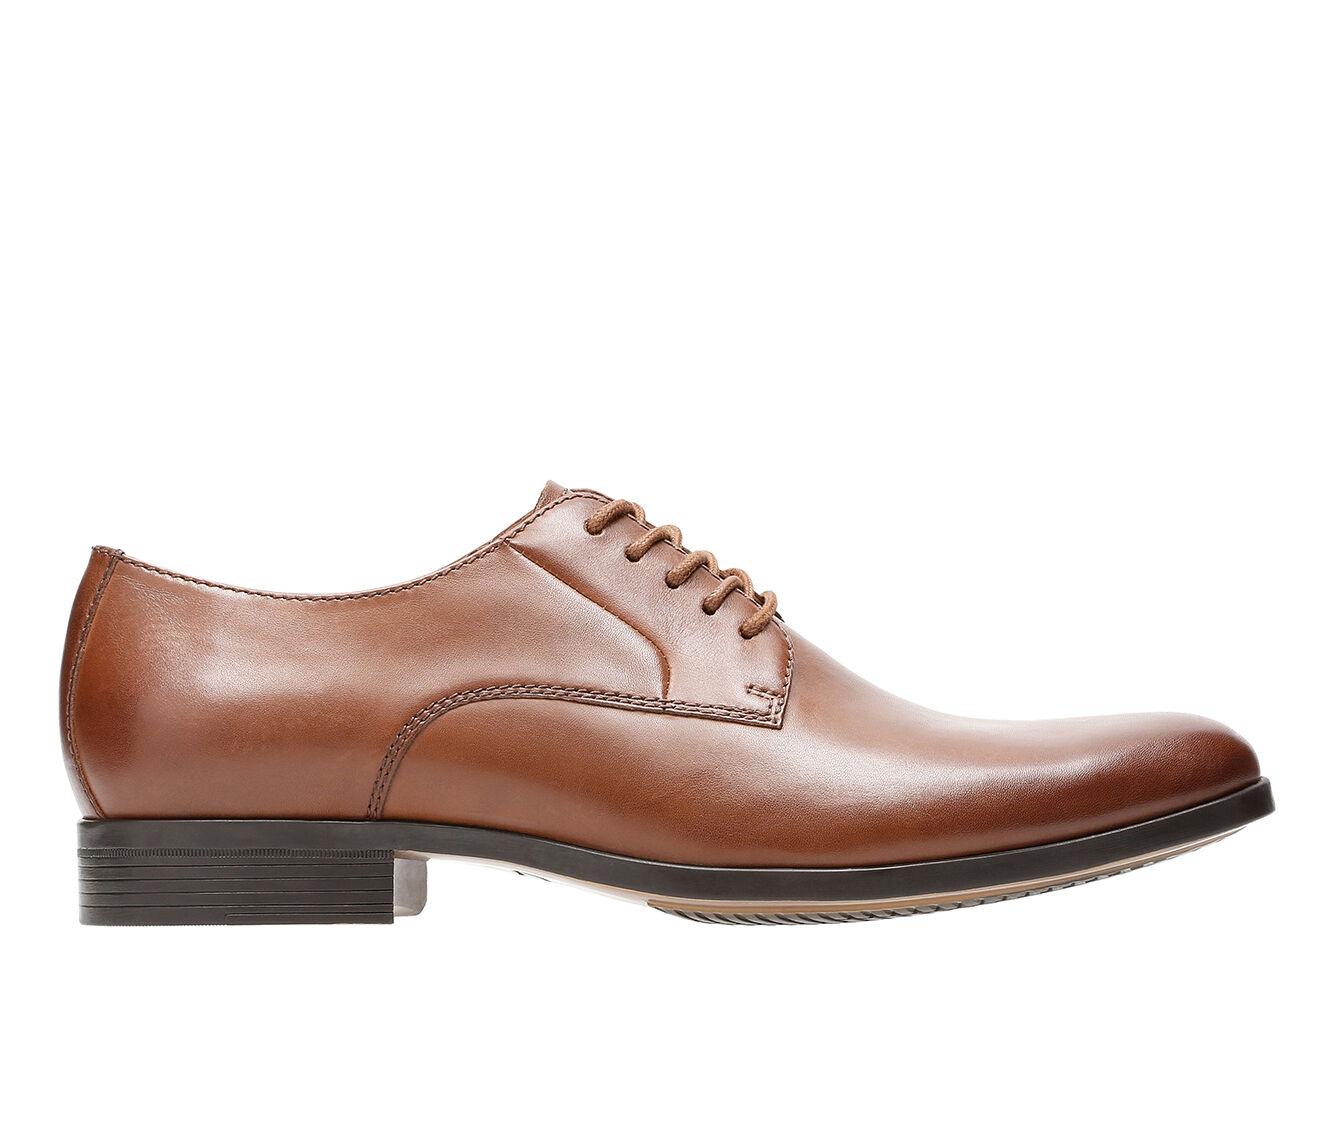 Men's Clarks Conwell Plain Dress Shoes Tan